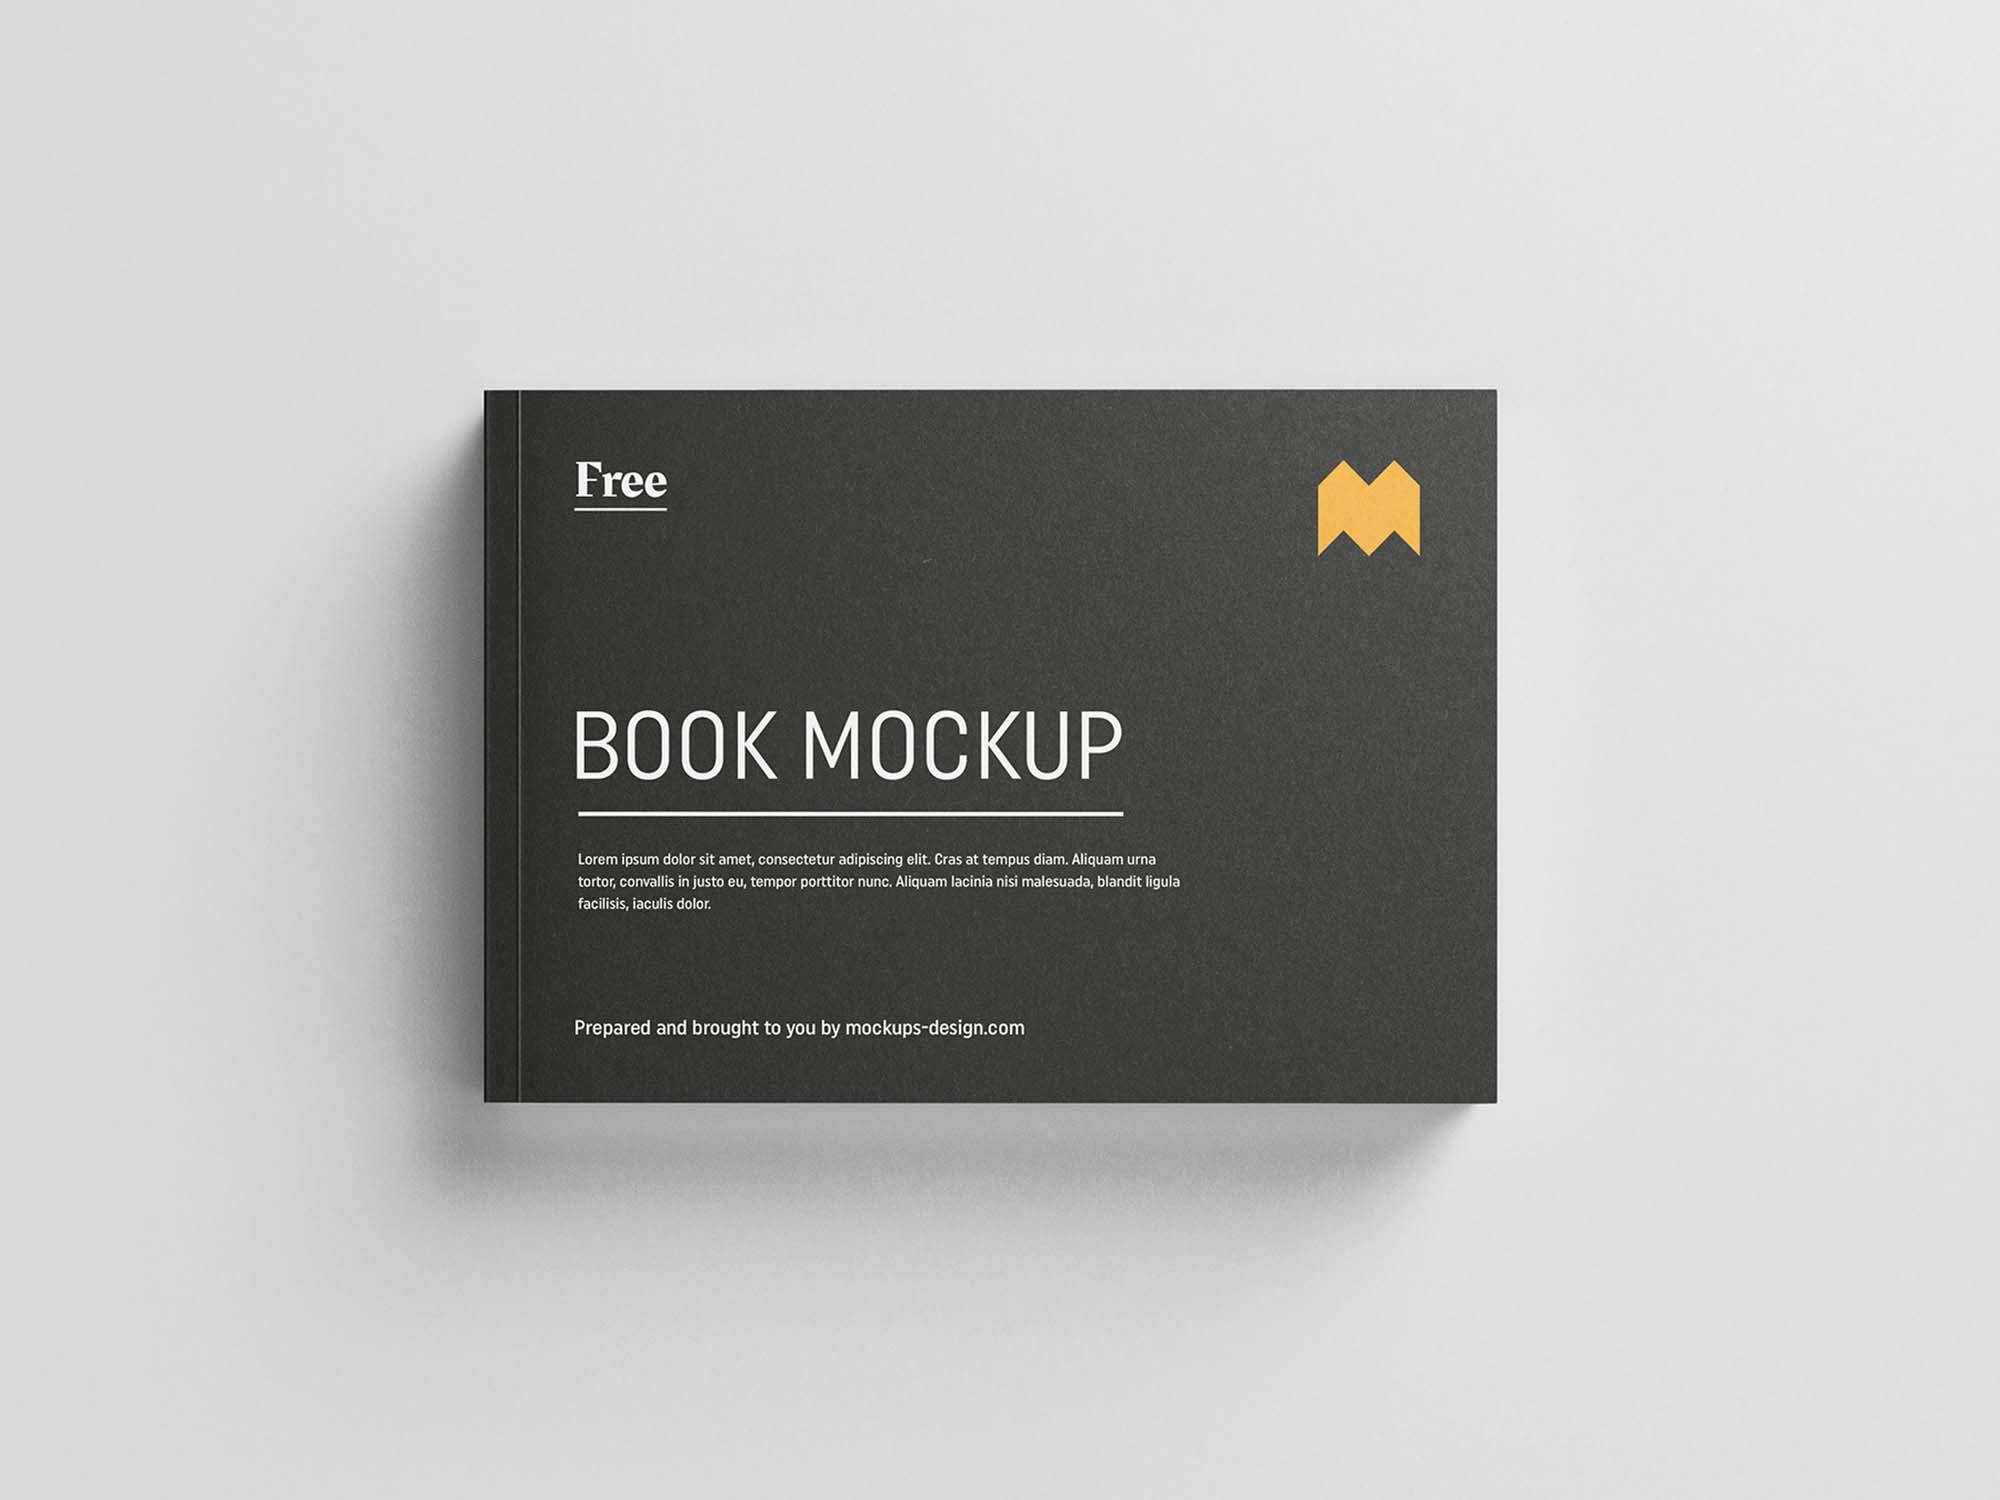 Landscape Softcover Book Mockup 2